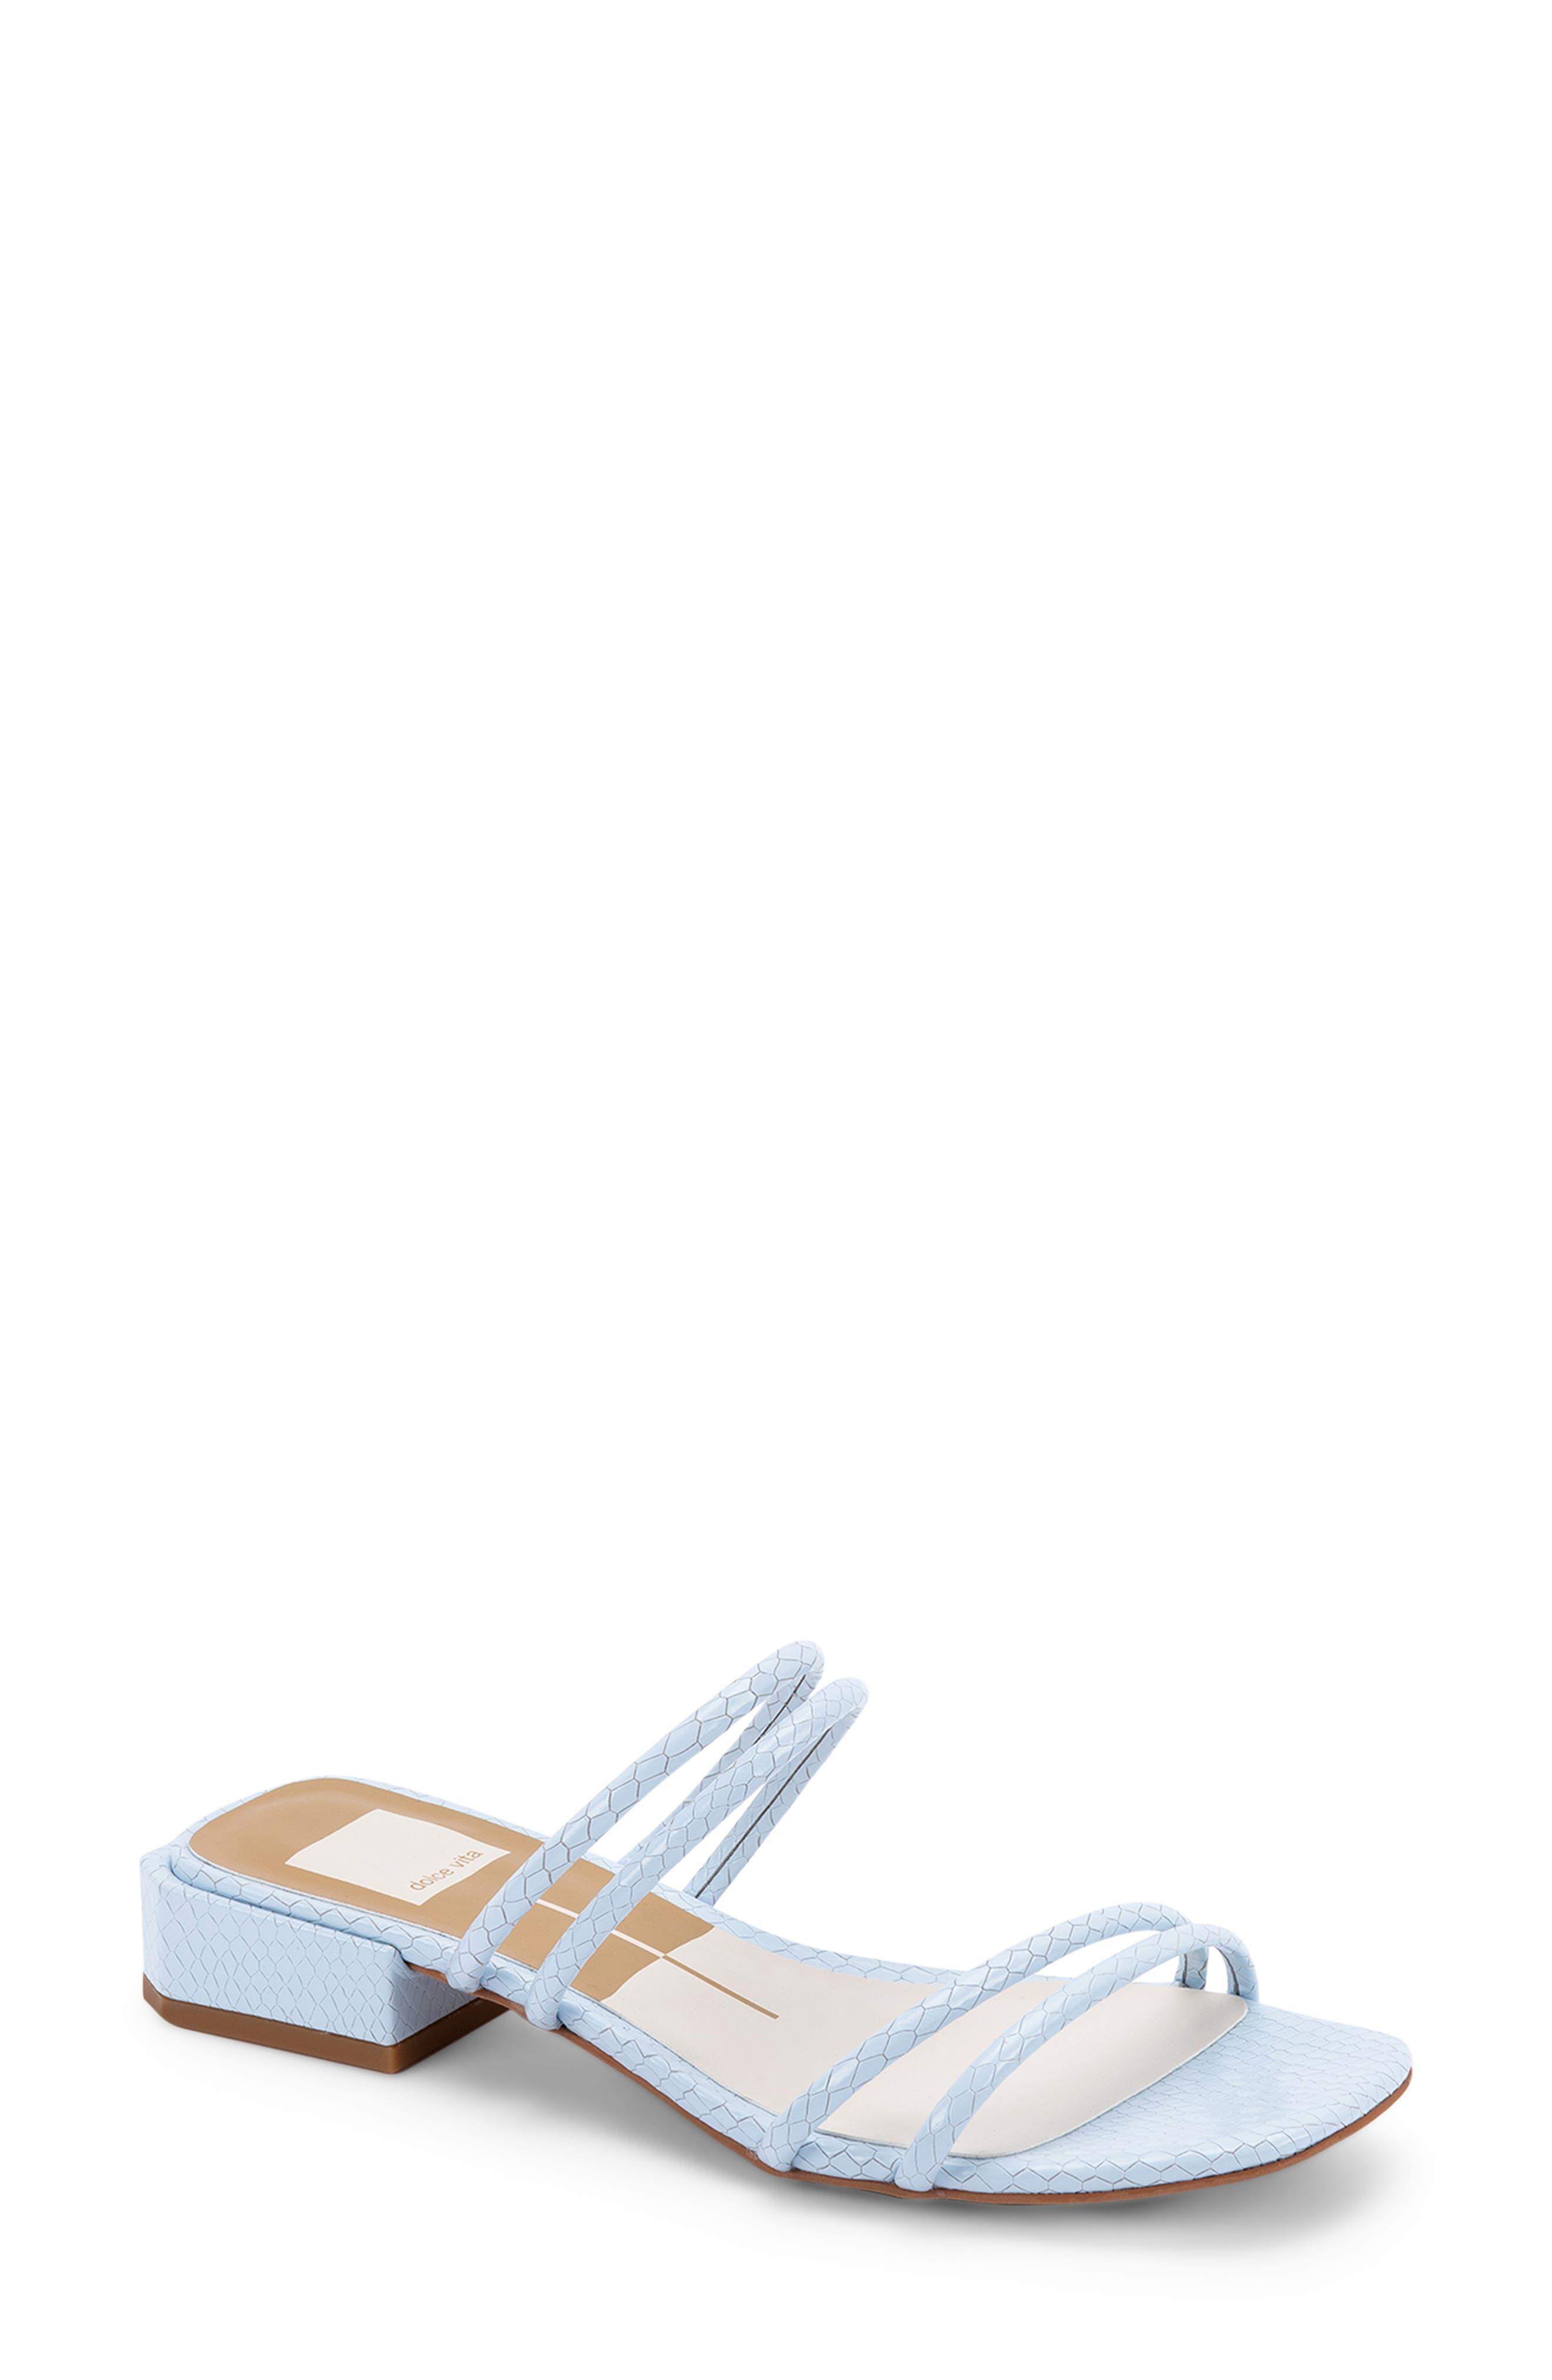 Haize Strappy Slide Sandal